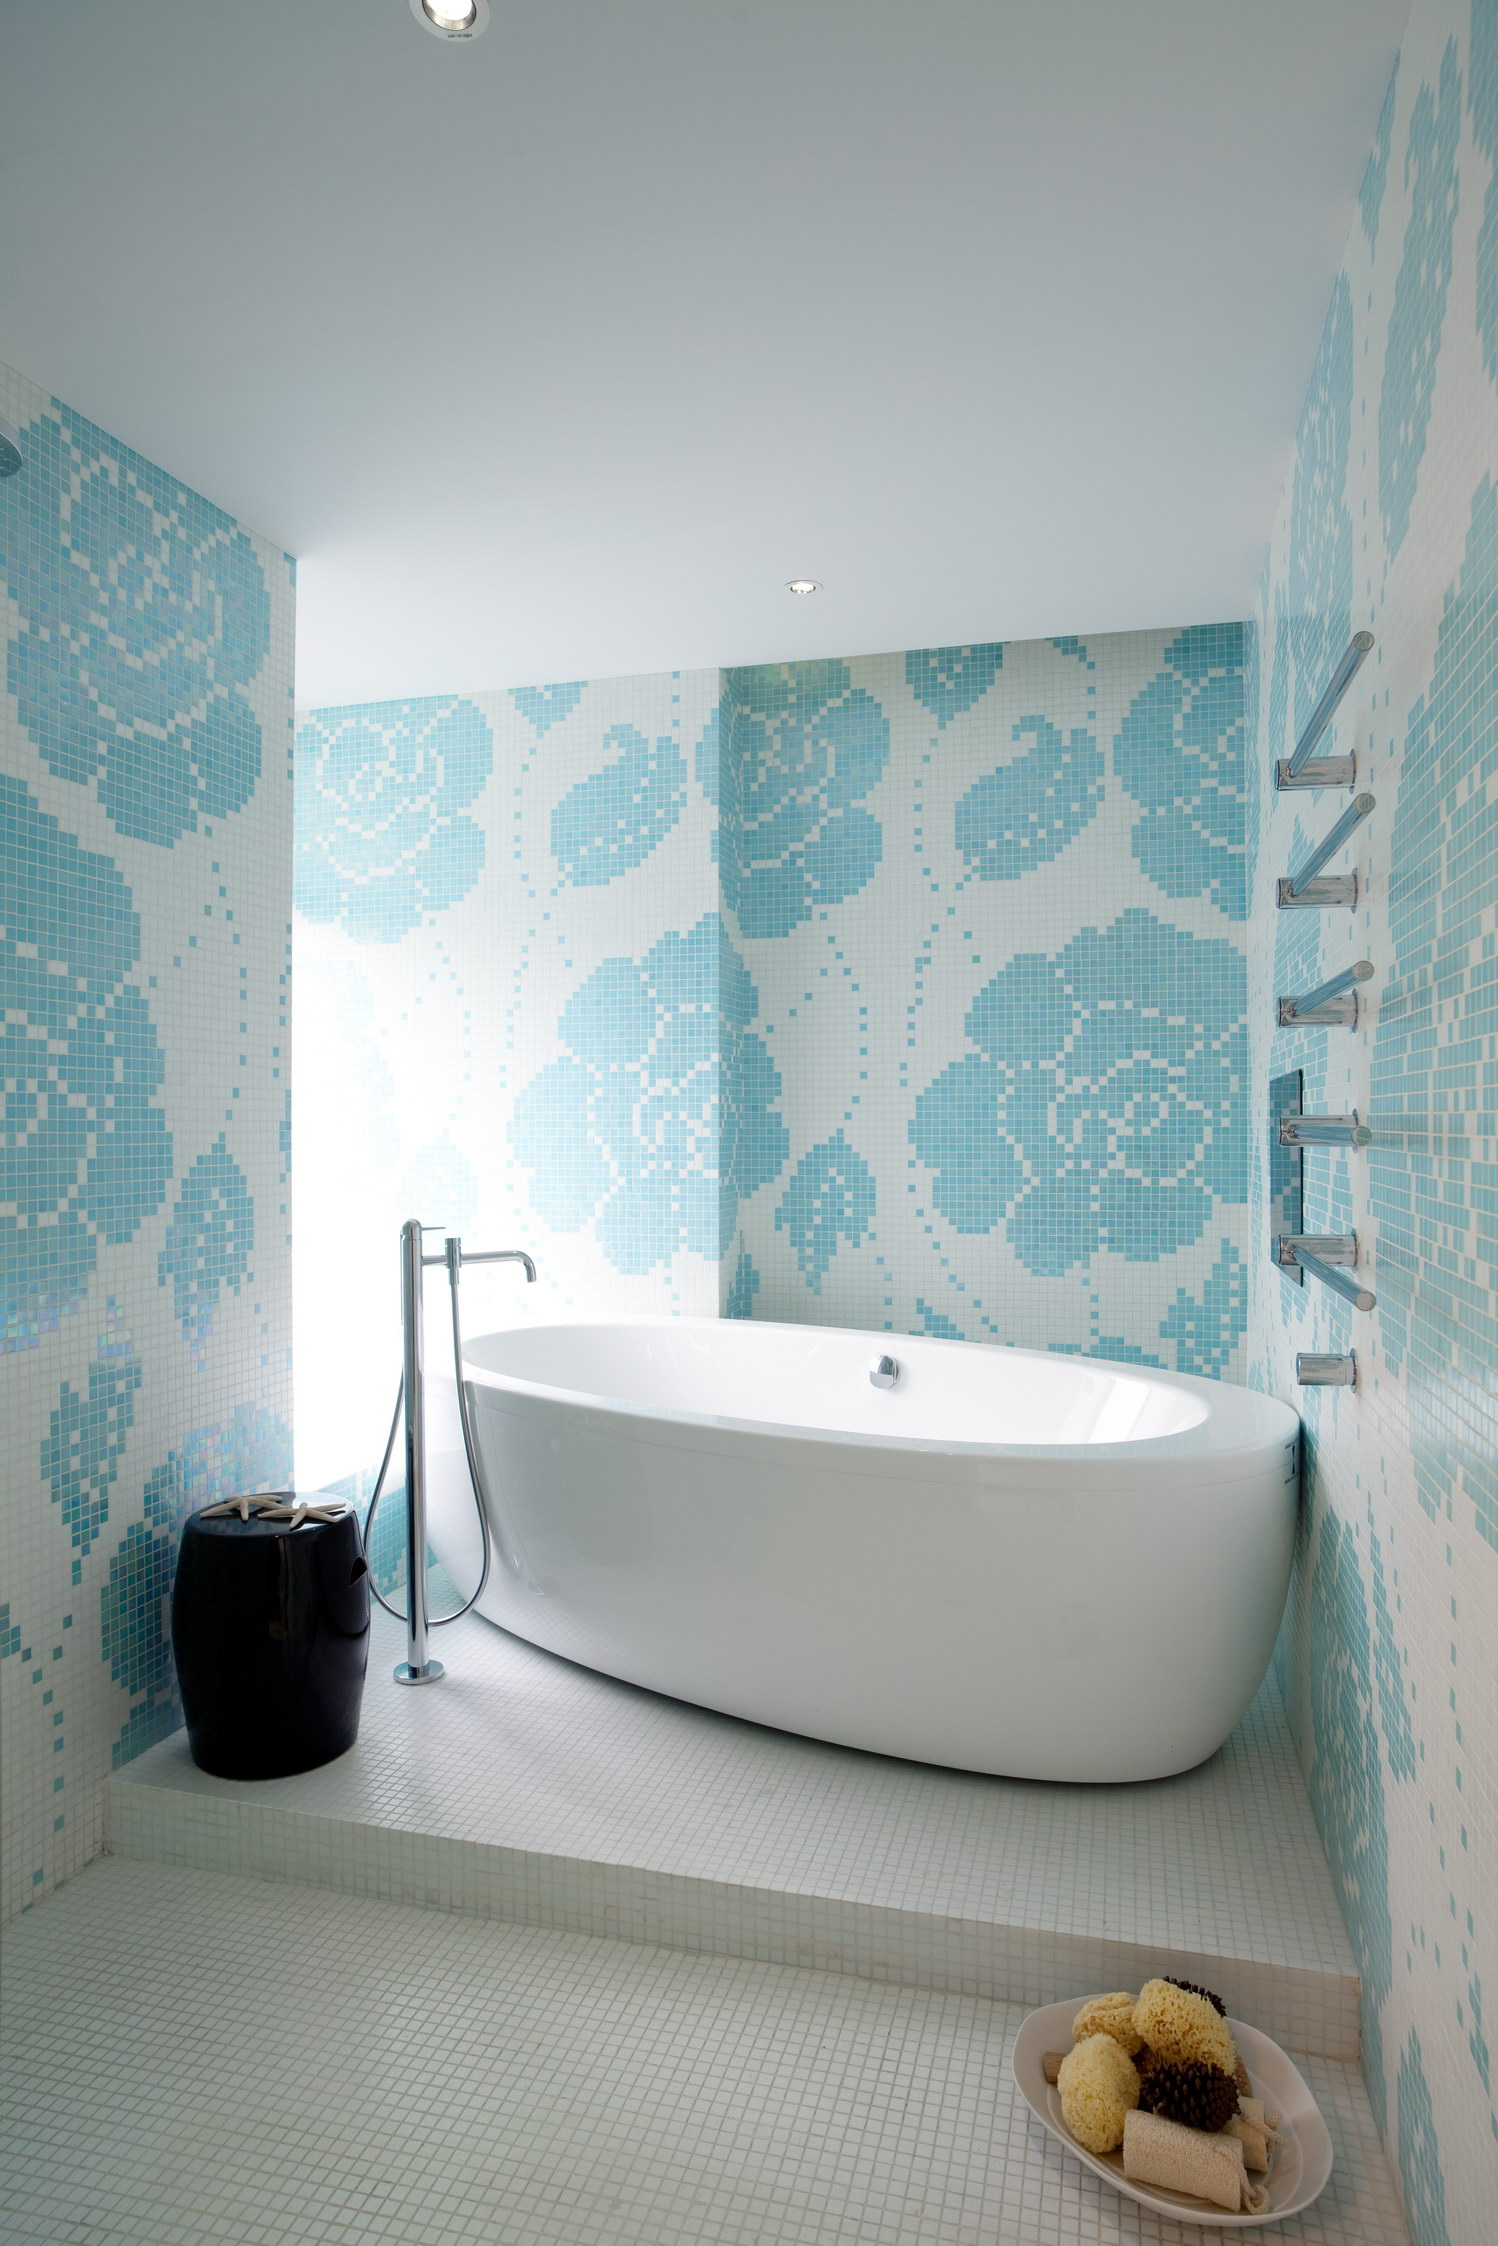 BATHROOM Bisazza mosaic tiles and Laufen bathtub